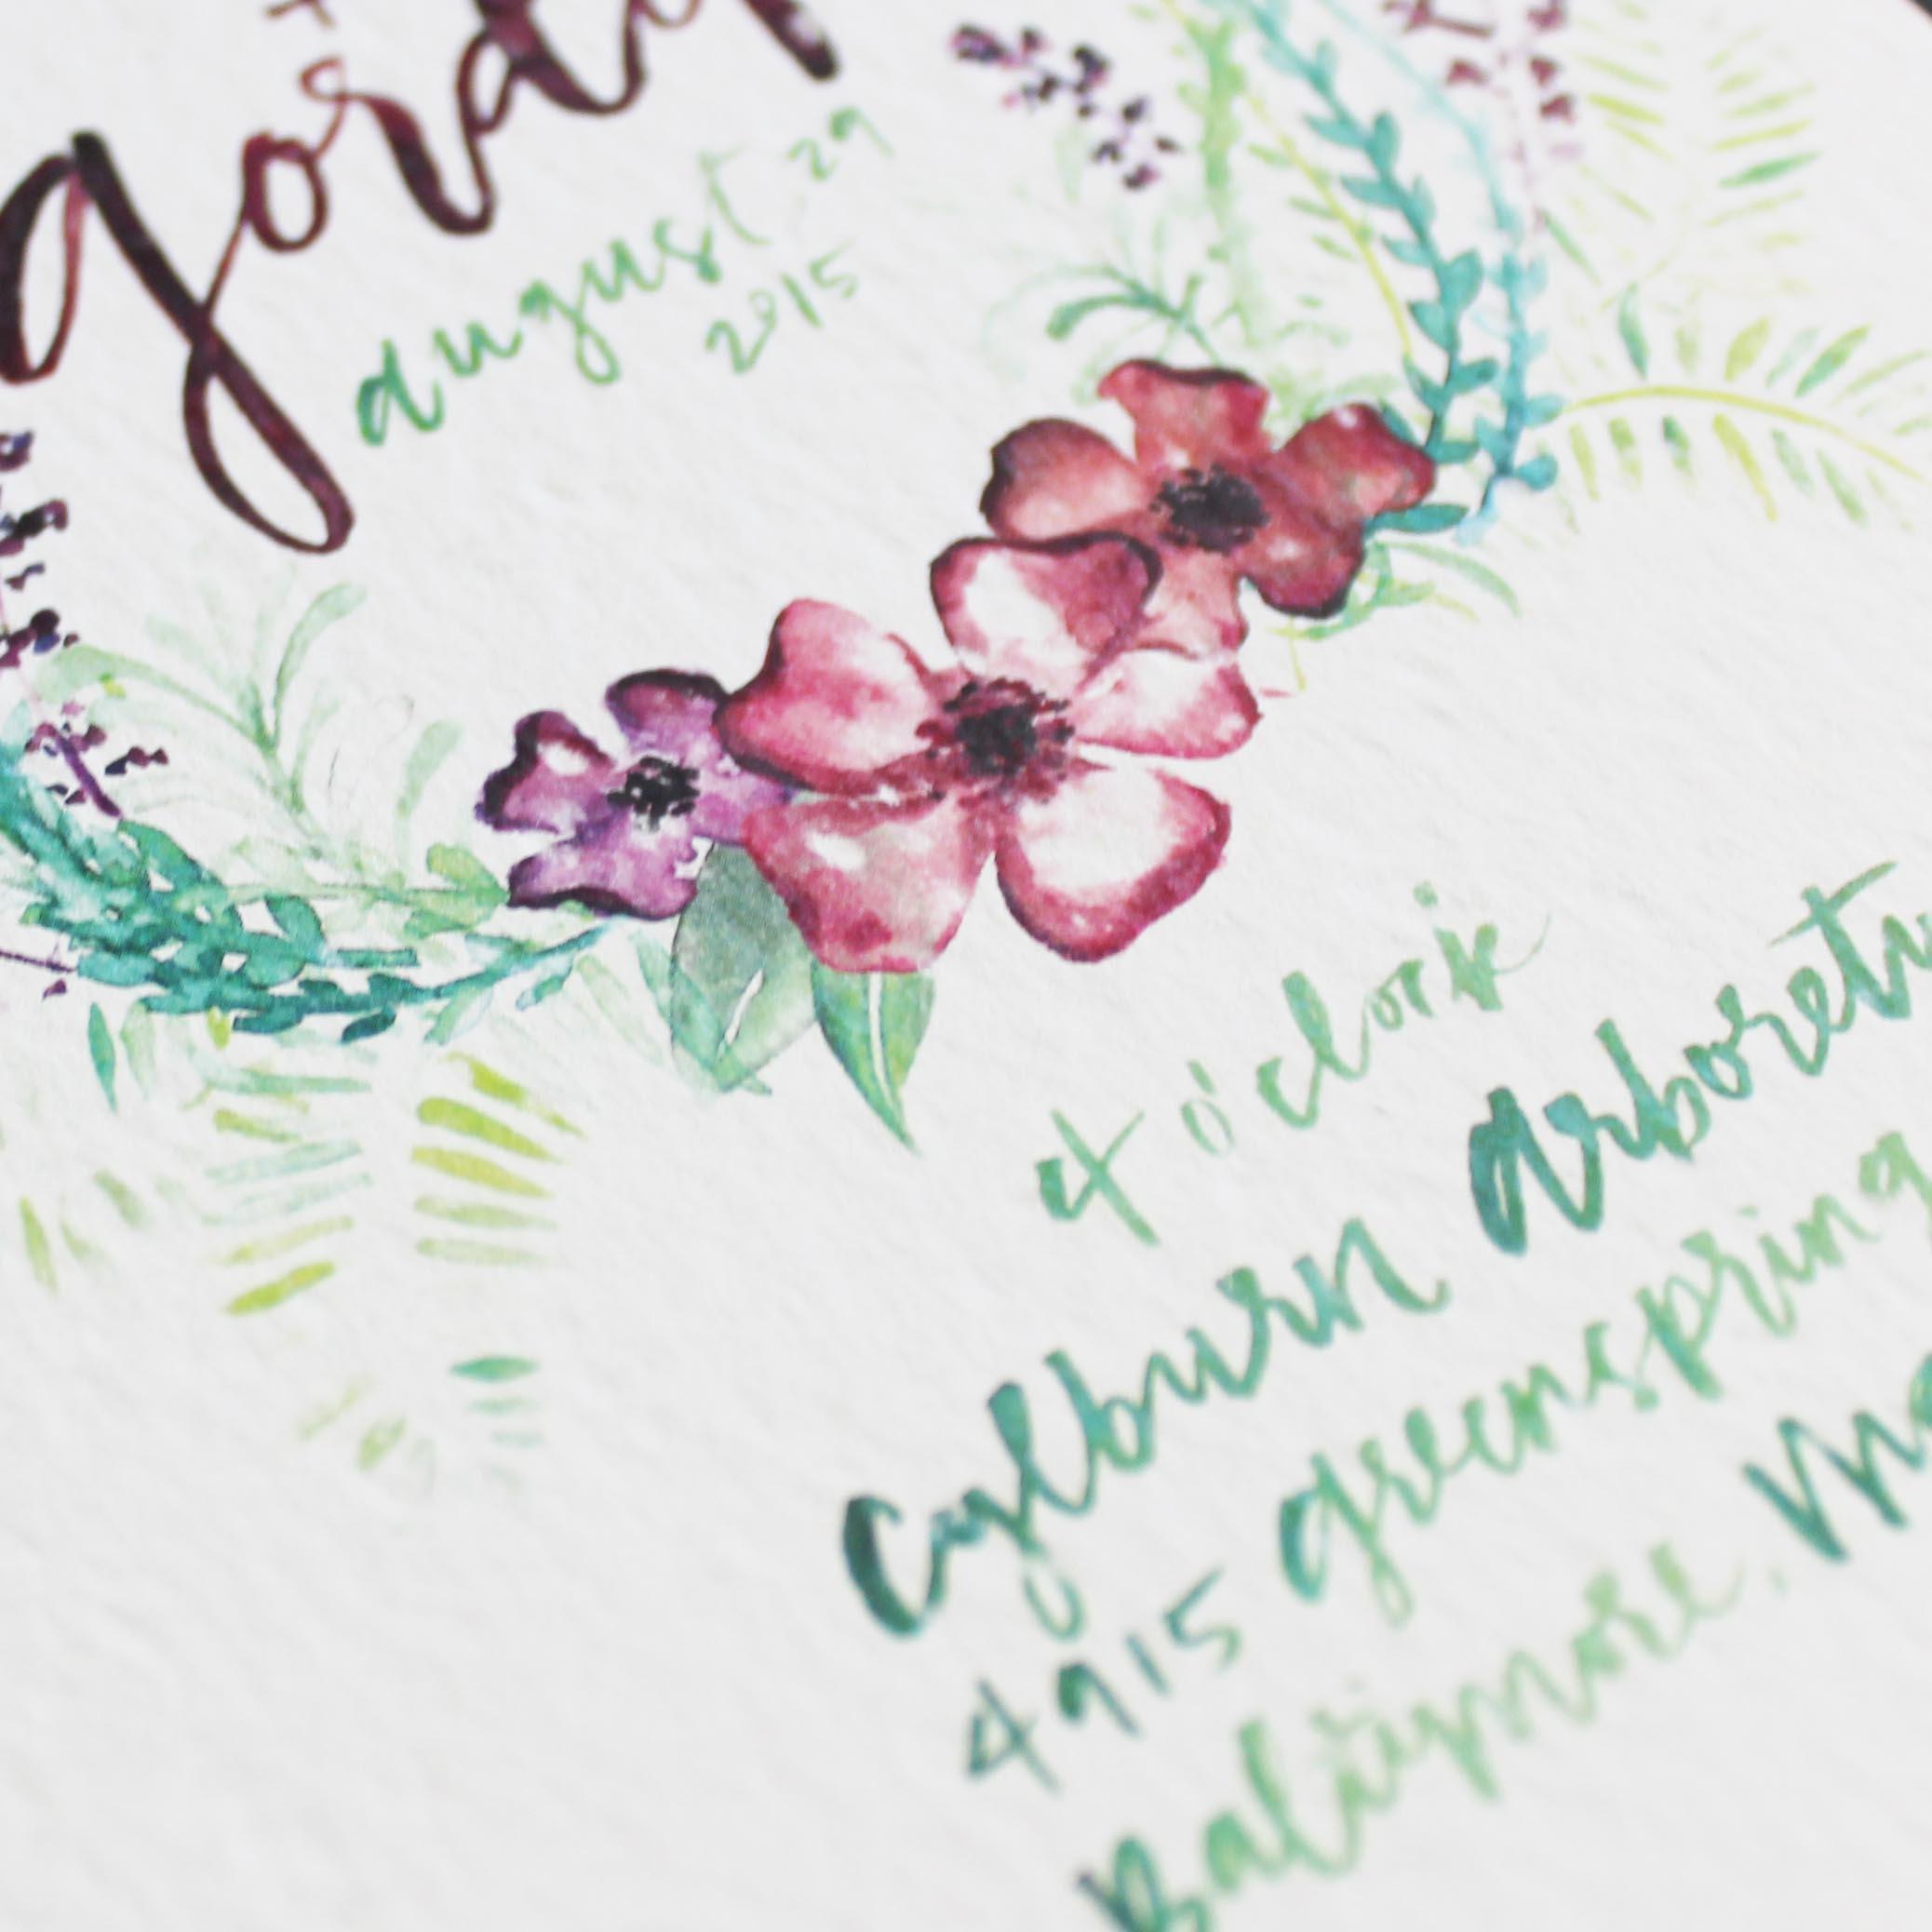 Watercolor Bohemian Floral Wedding Invitations by Ashley Bush